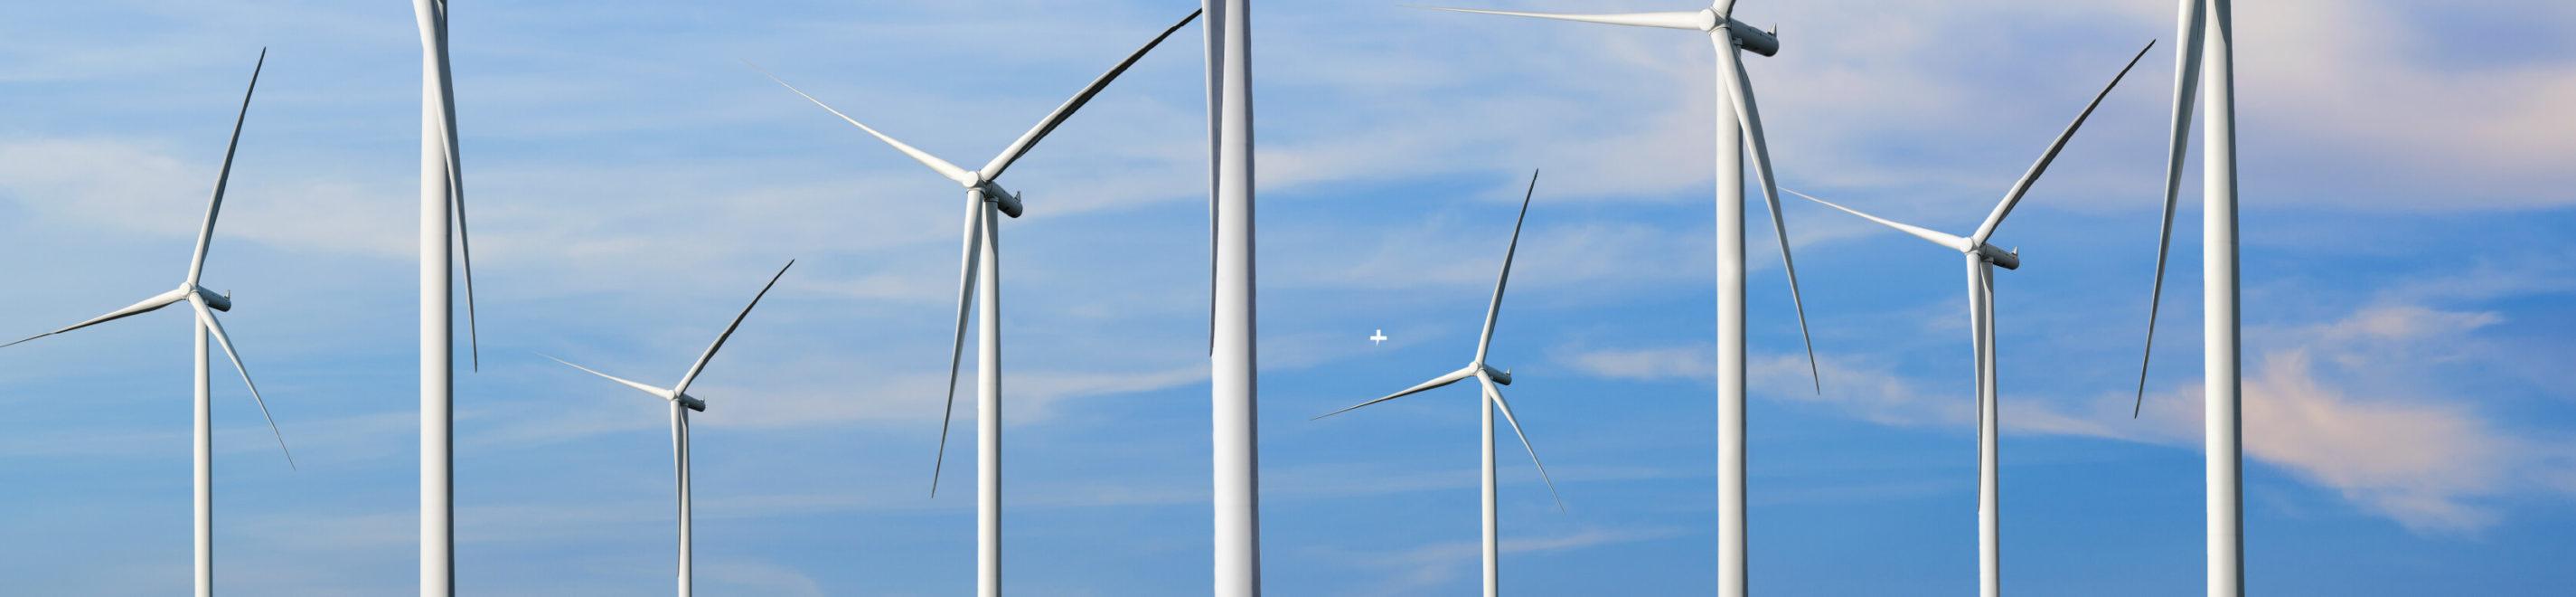 Energy renewables banner 2